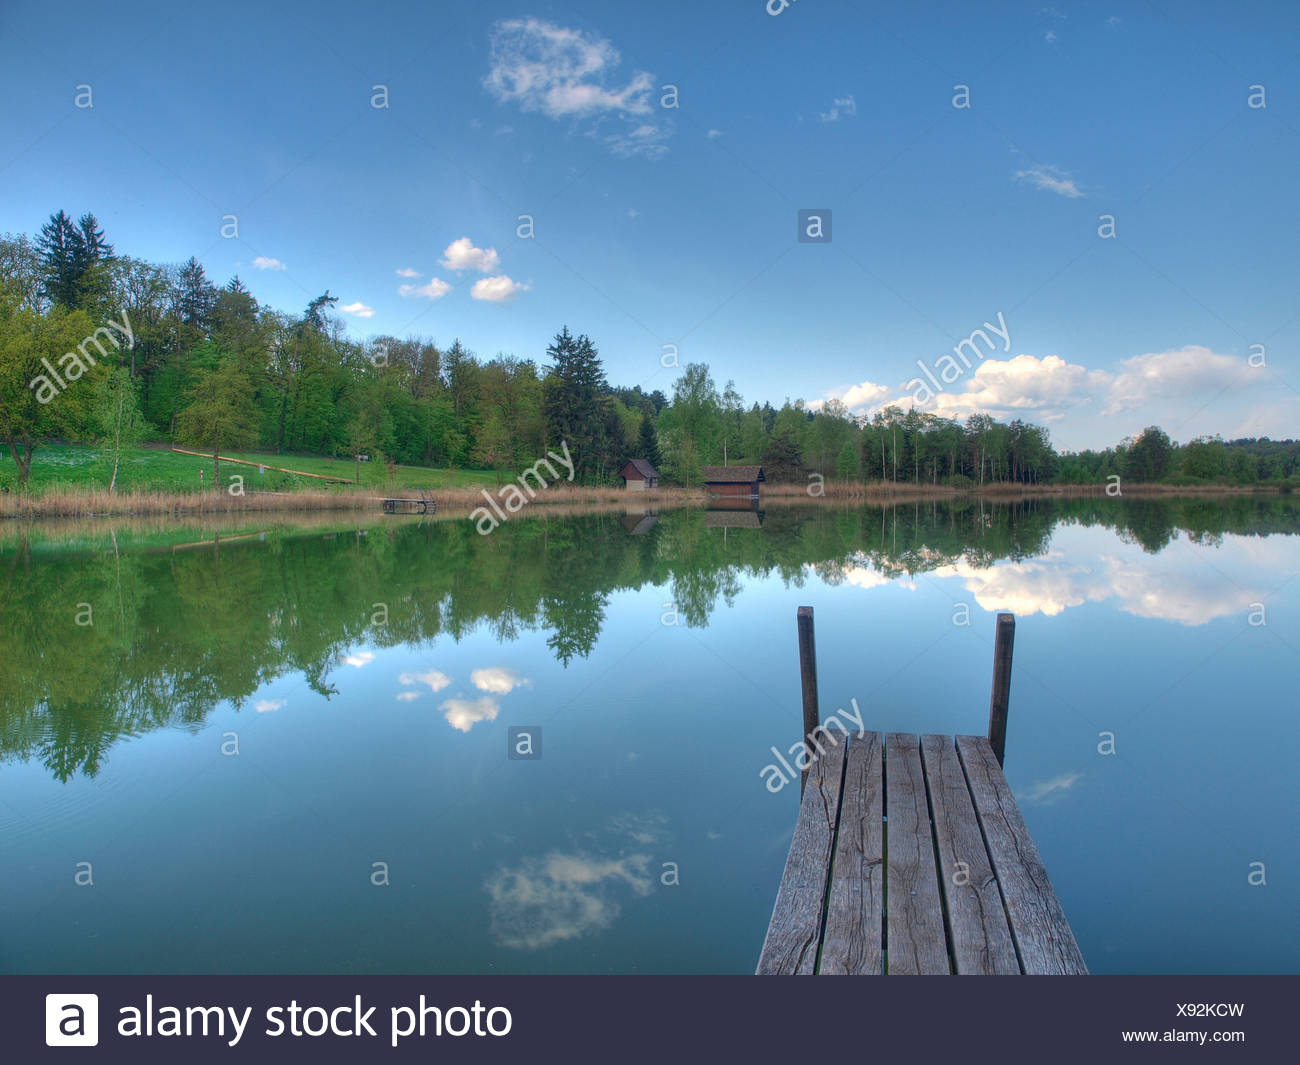 Blau, Feder, Himmel, Idylle, Steg, See, Holz, Wald, Wasser, Wolken, Kanton Zürich, Schweiz, Husemersee, See, Ossinge Stockbild